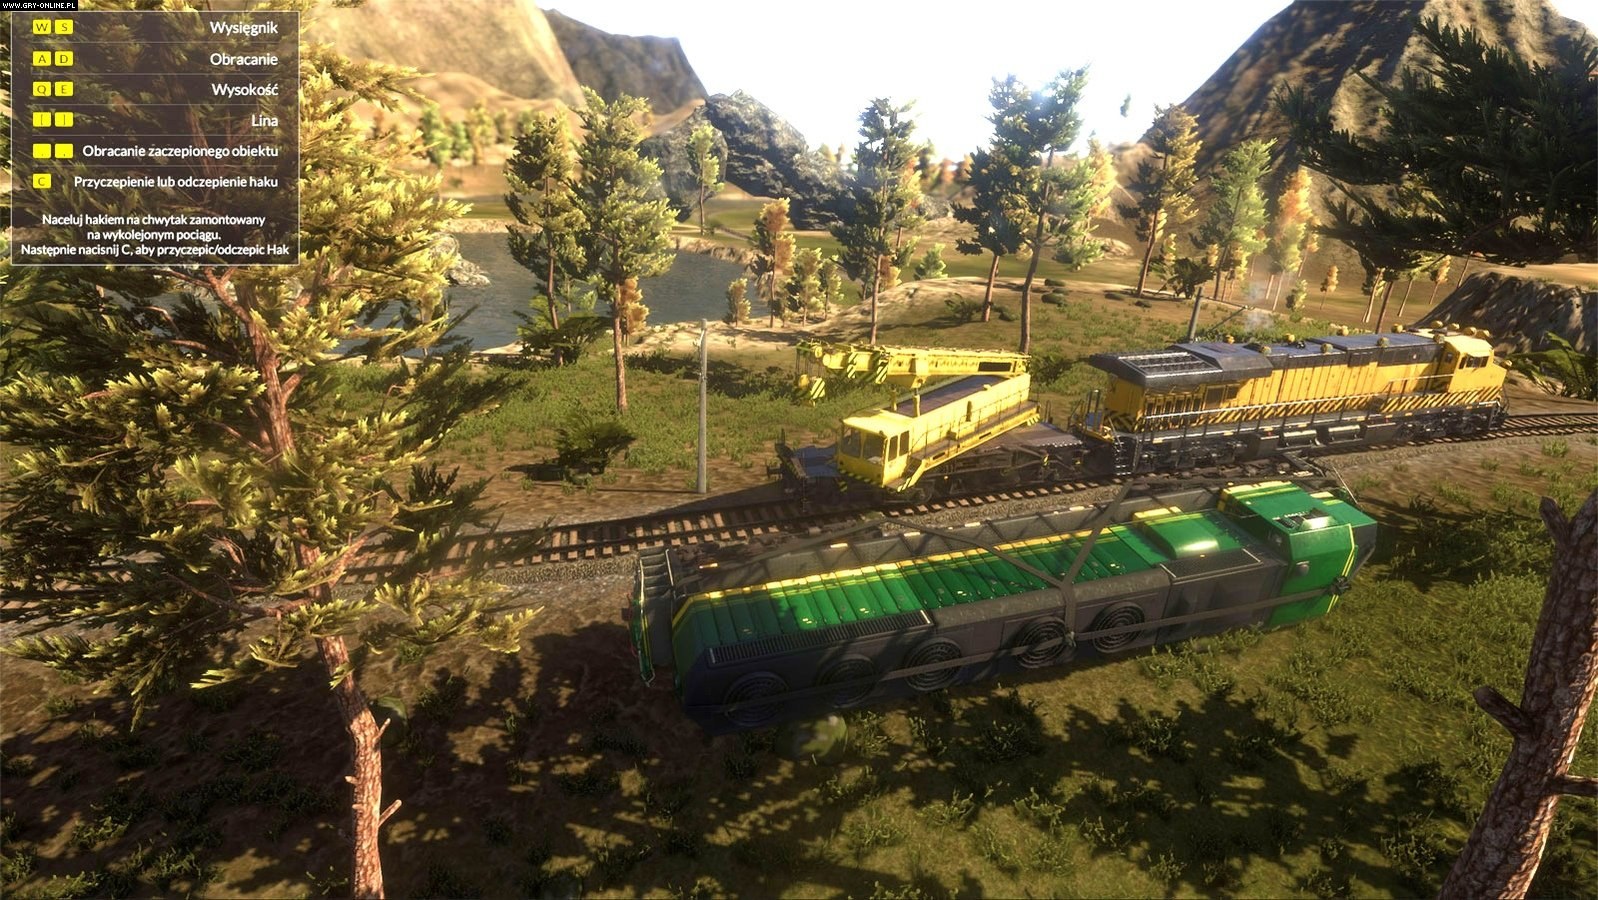 Train Mechanic Simulator 2017 PC Games Image 5/38, Si7 Studio, PlayWay